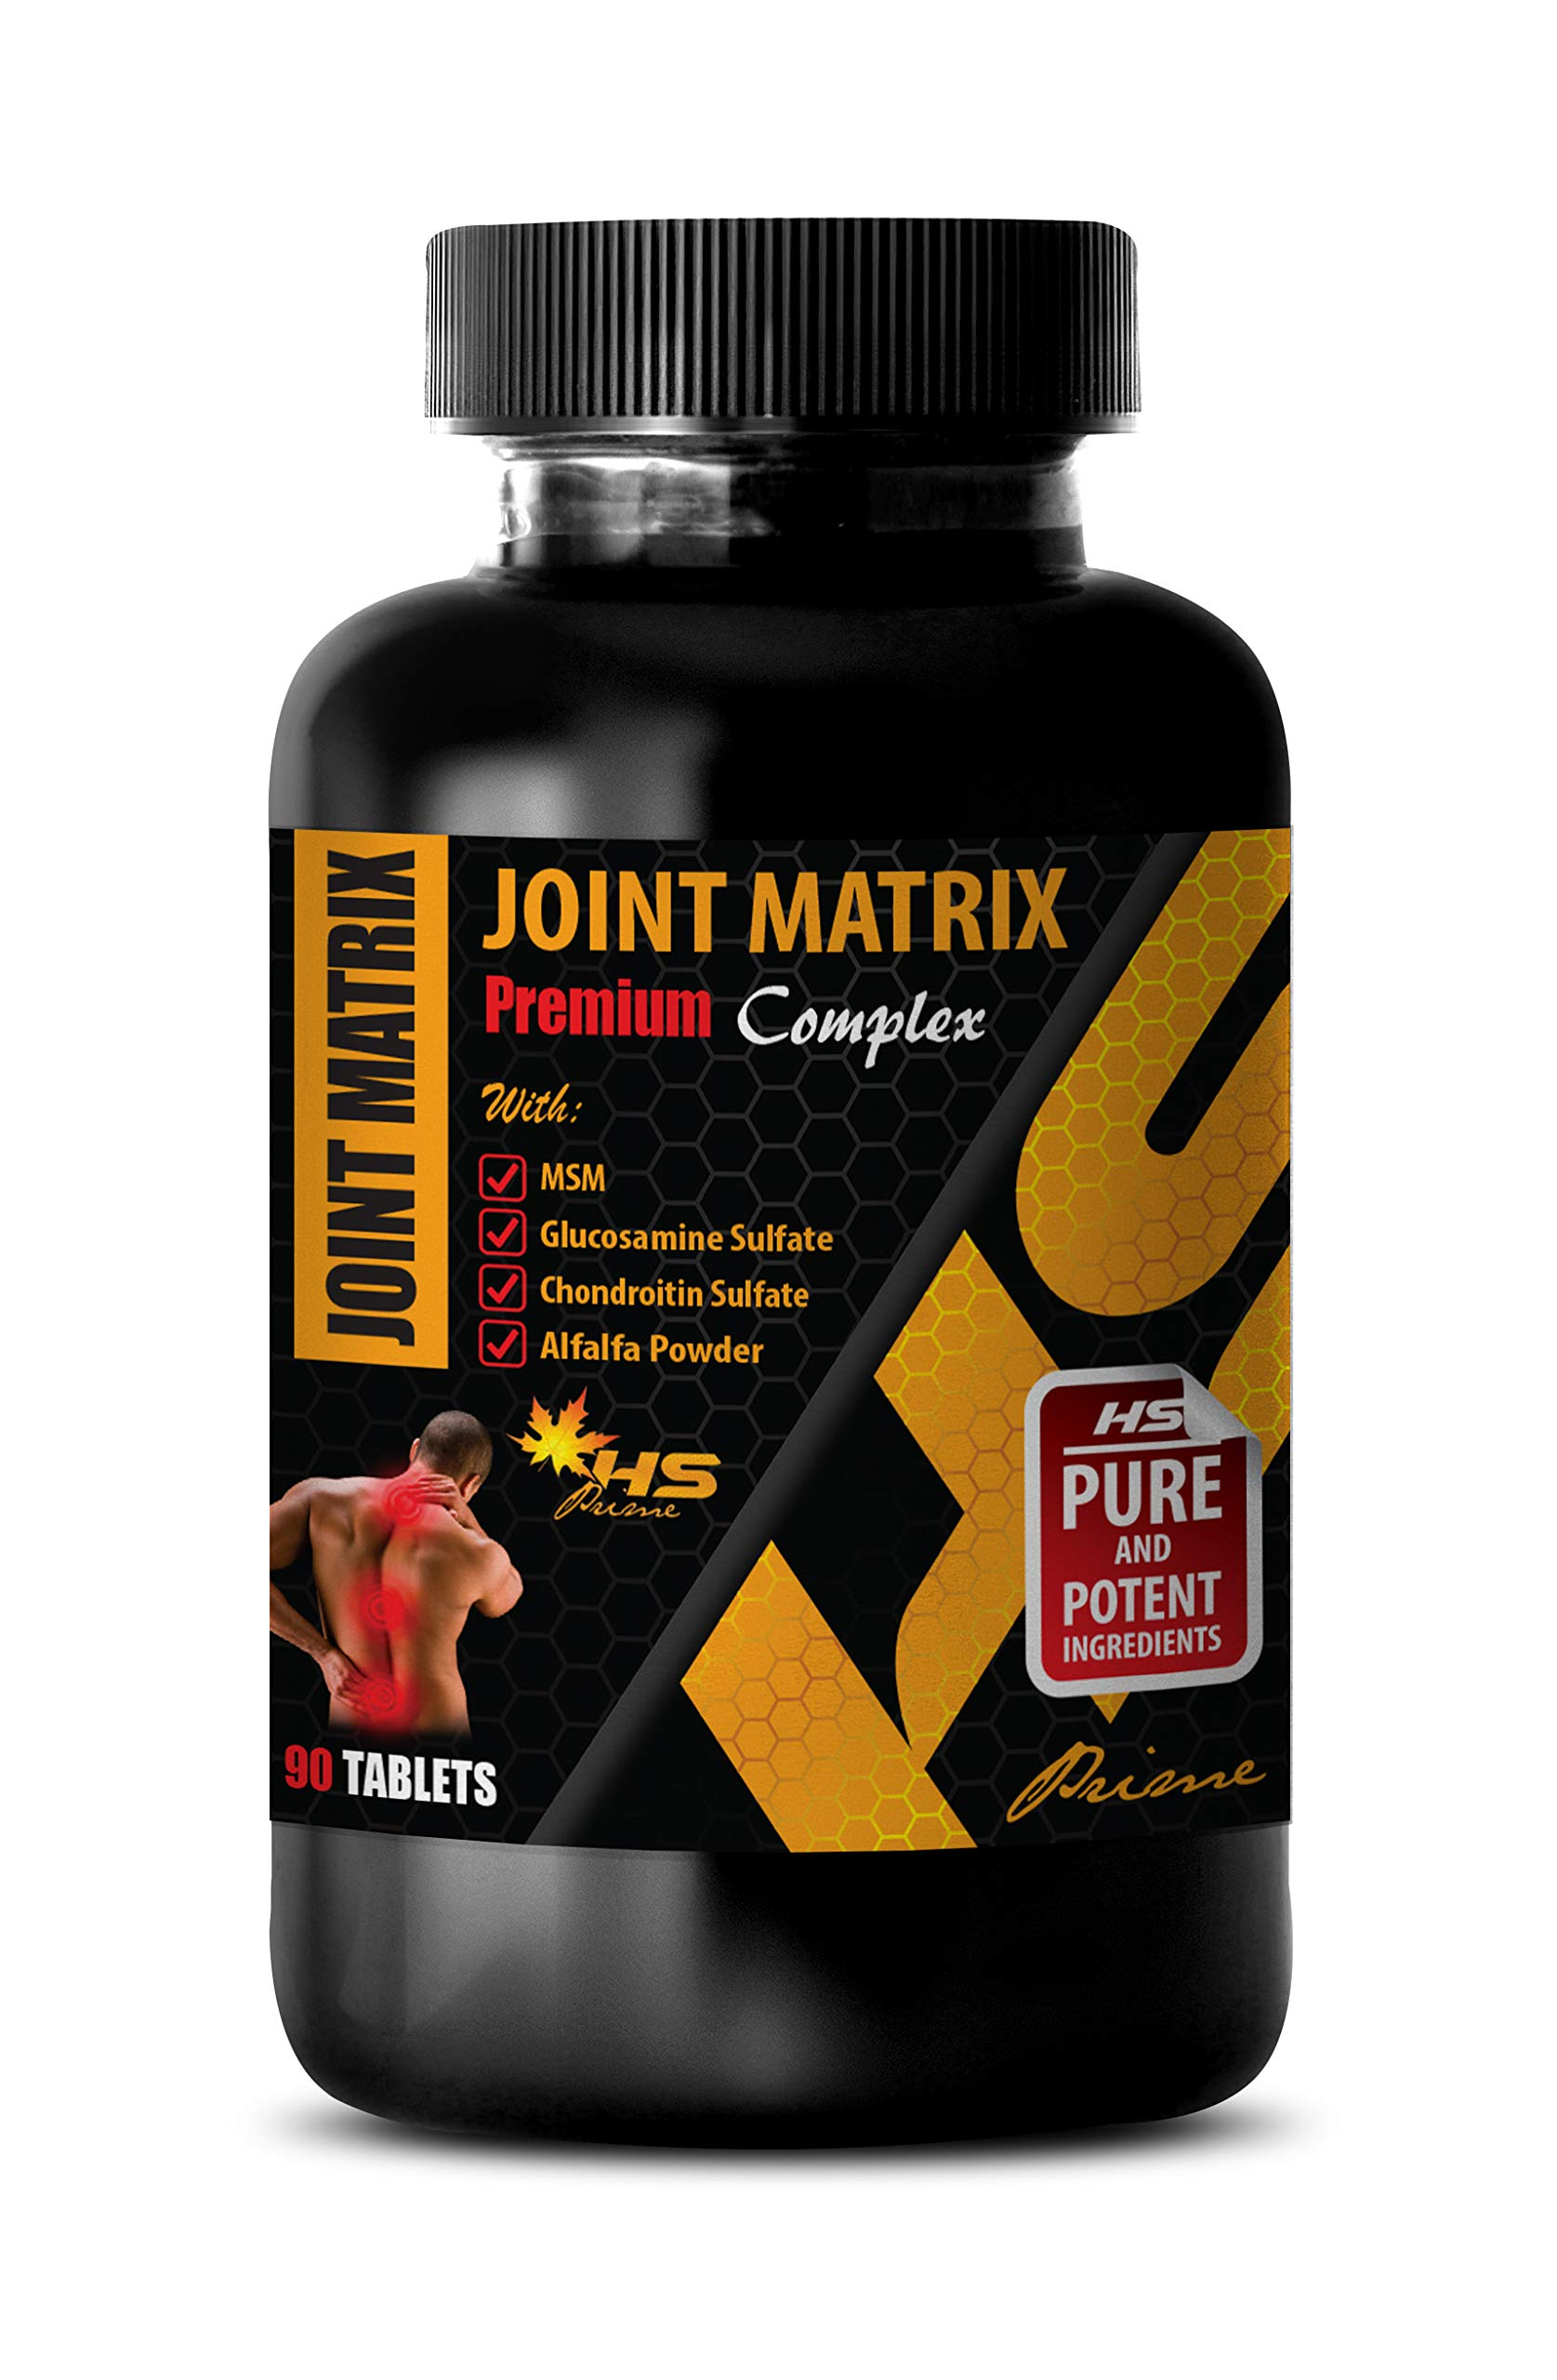 Joint Support Supplements Best Seller - Joint Matrix 2170MG - Premium Complex - Msm Supplement Pills - 1 Bottle 90 Tablets